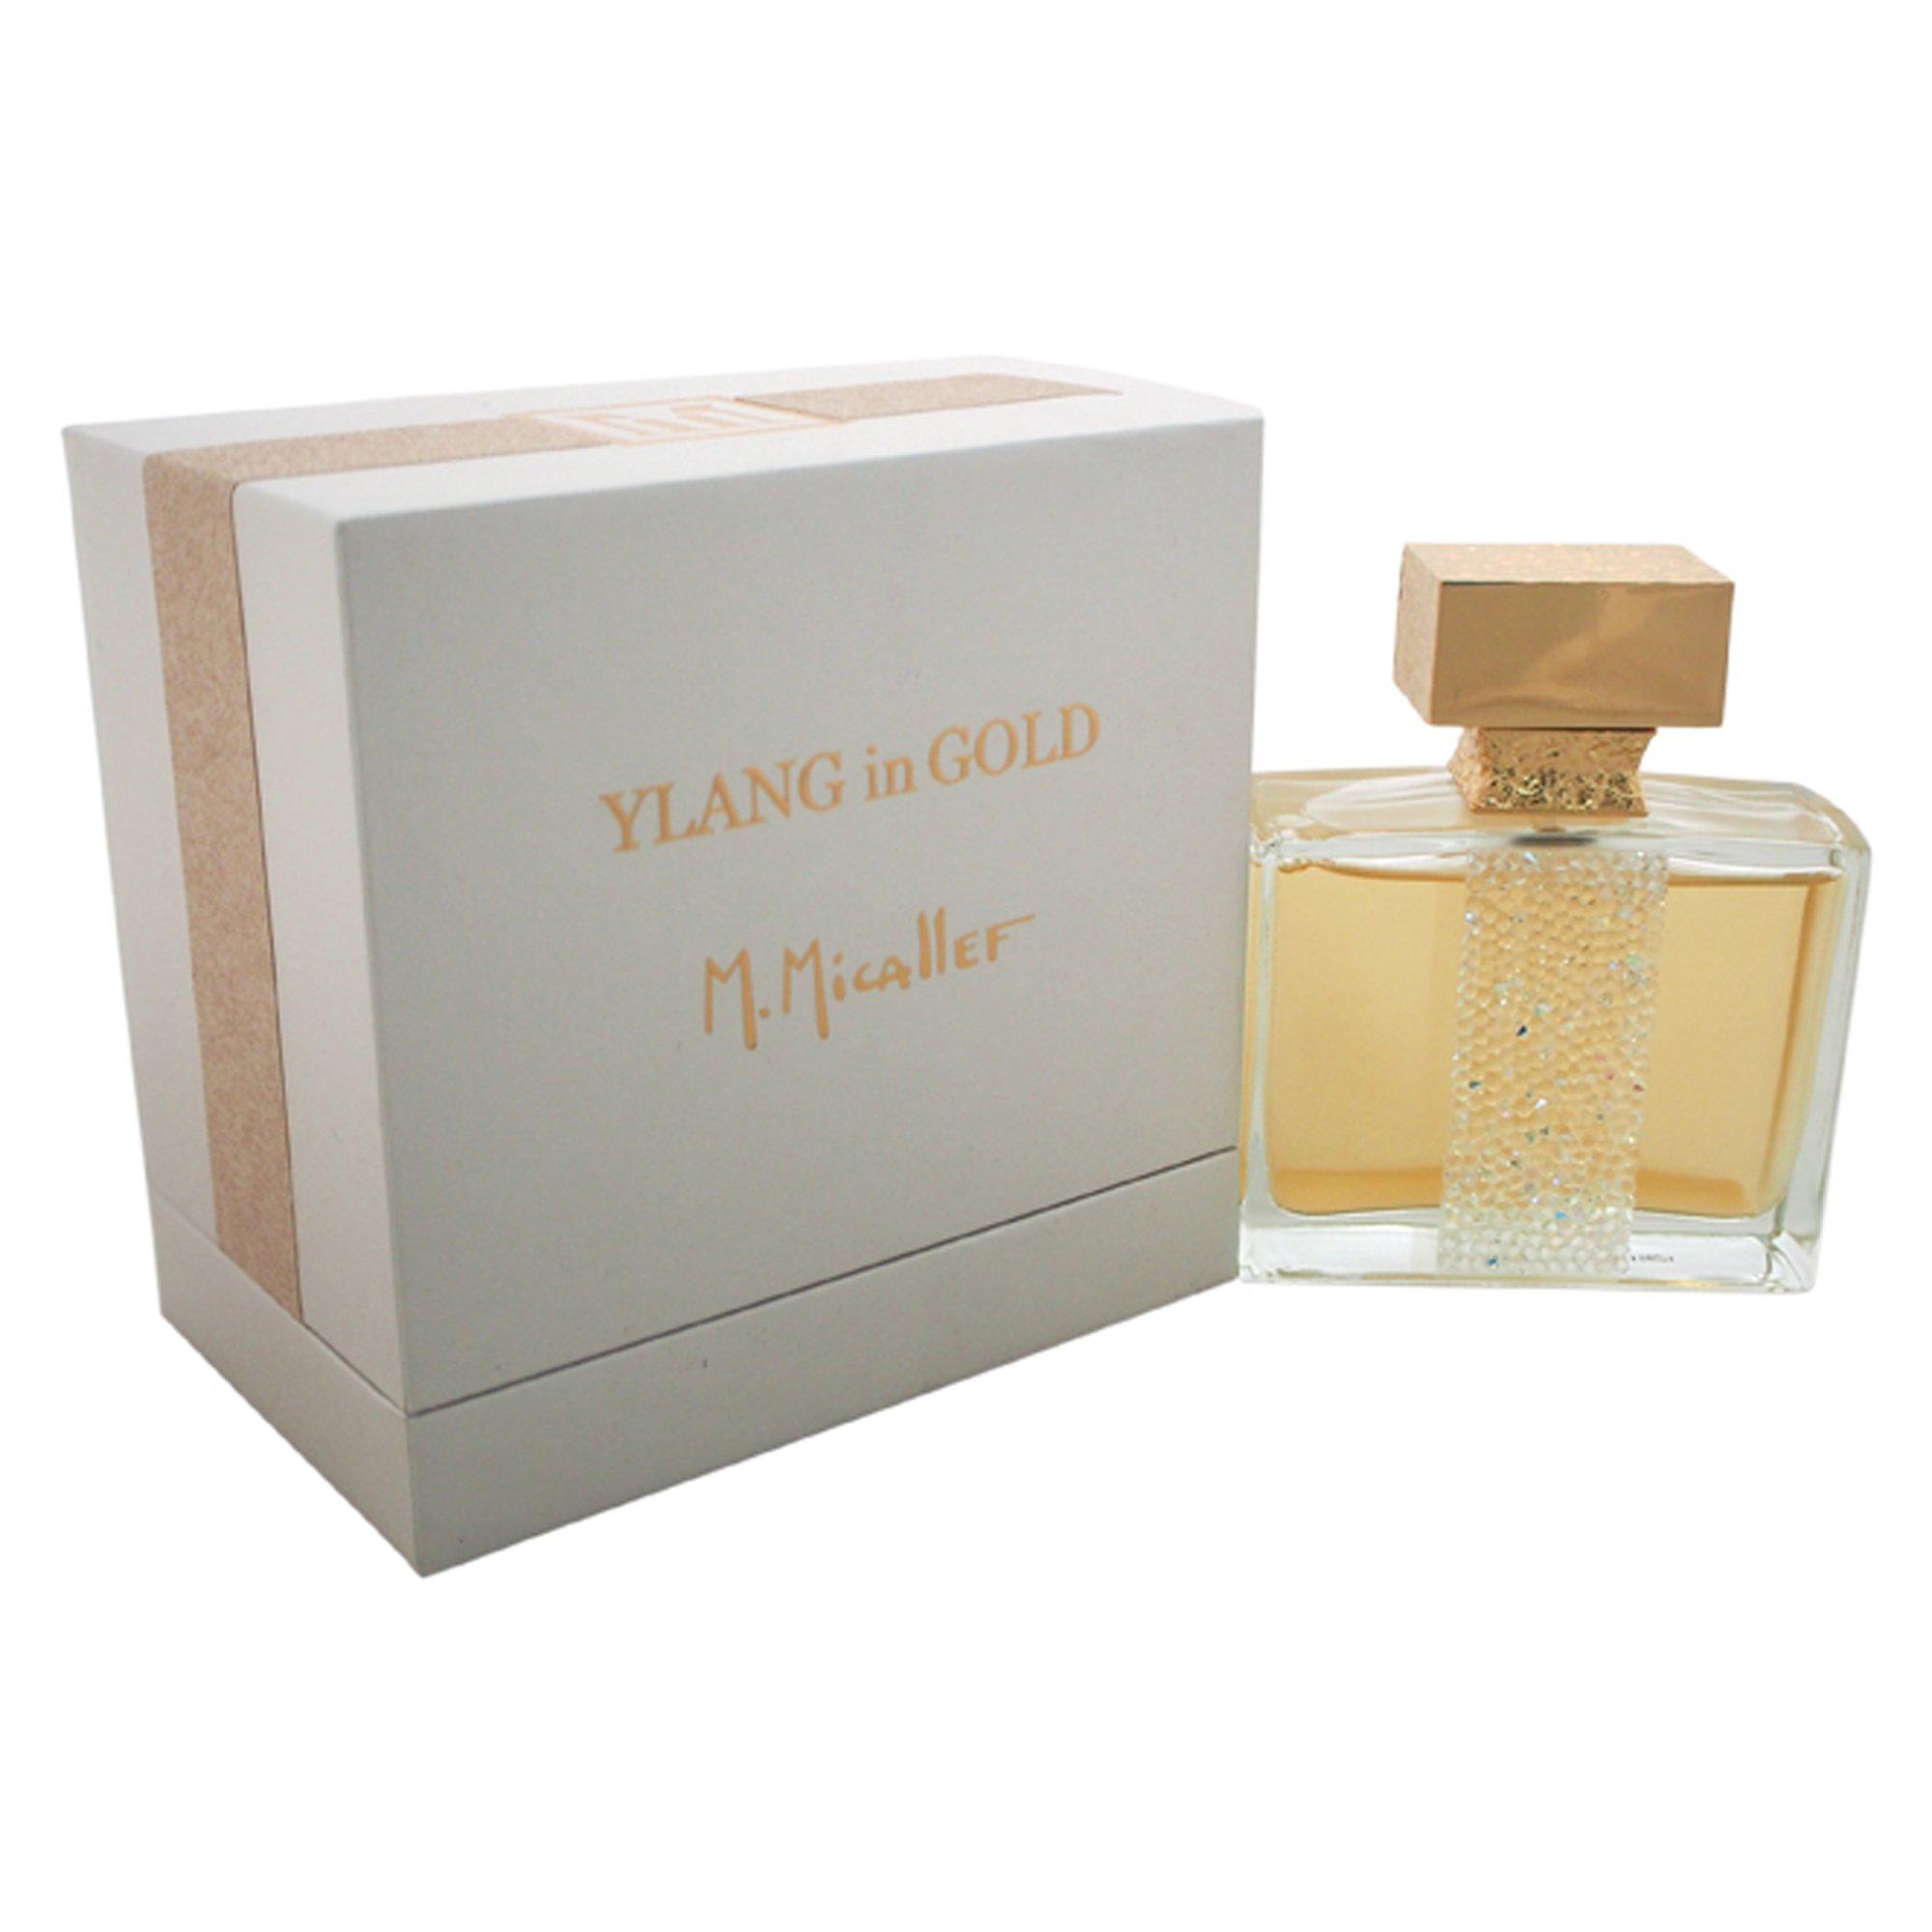 M. Micallef Ylang In Gold Women's Eau de Parfum Spray, 3.3 Ounce